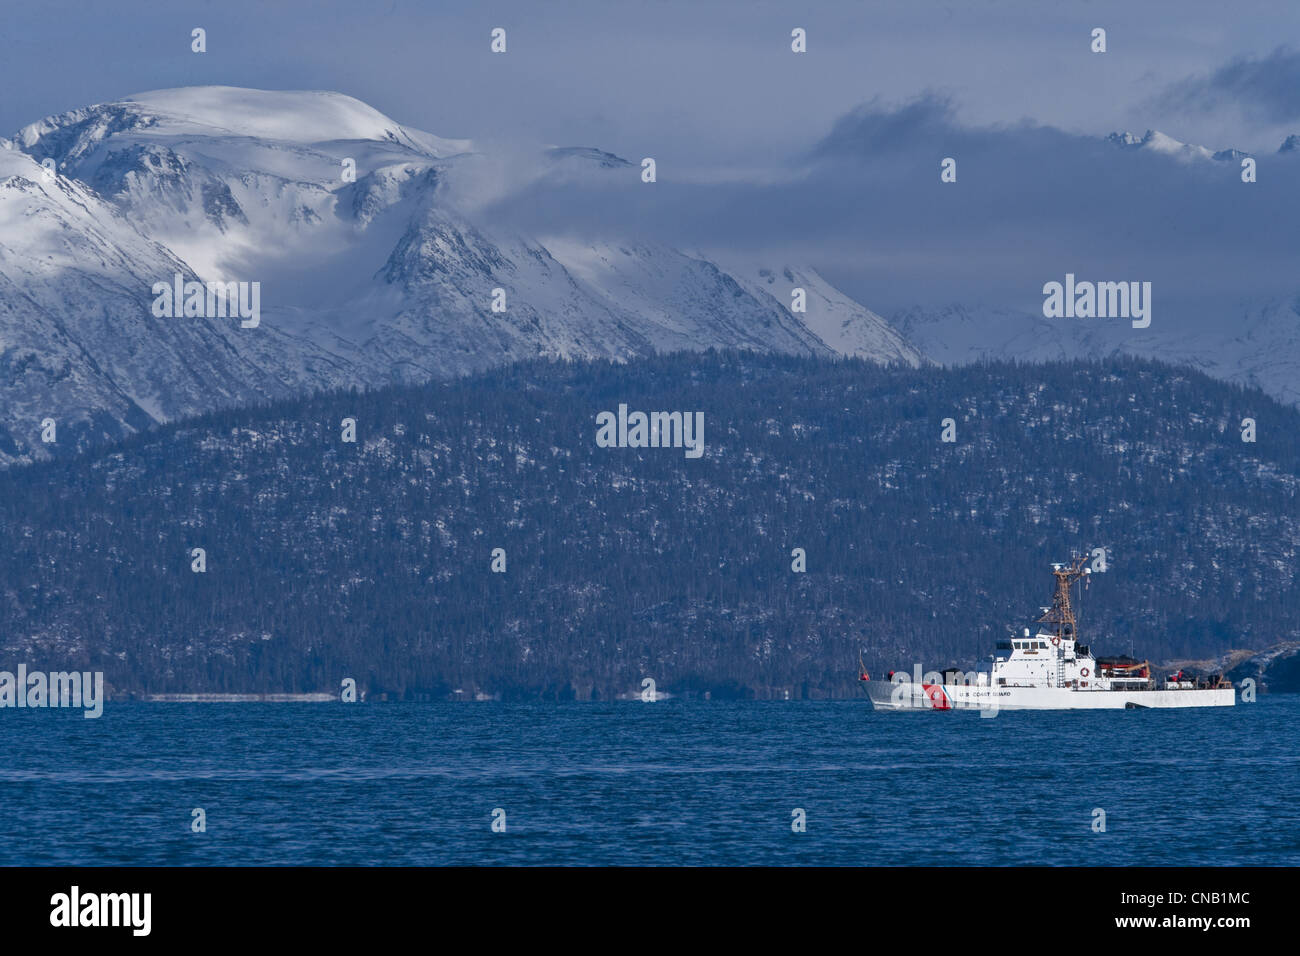 U.S. Coast Guard boat in Southeast Alaska, Summer - Stock Image